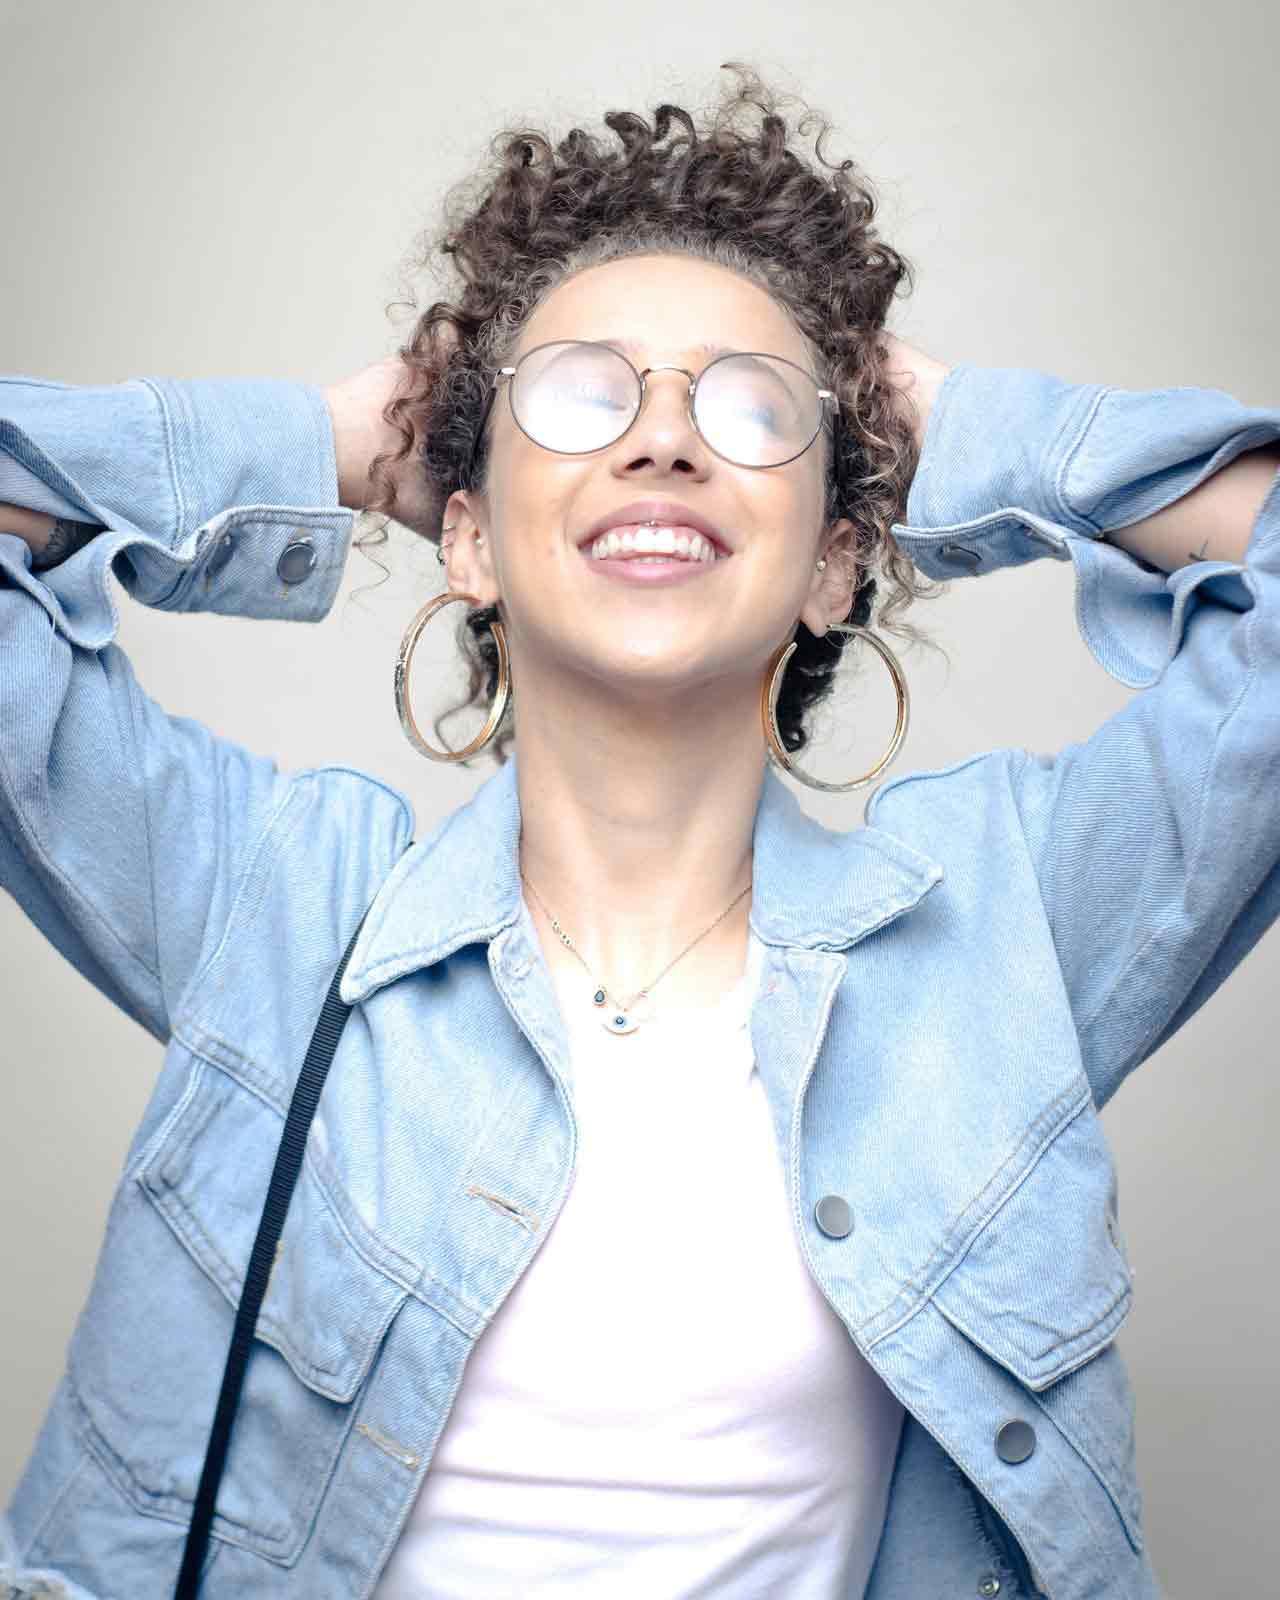 photo-of-woman-wearing-blue-denim-jacket-3341576